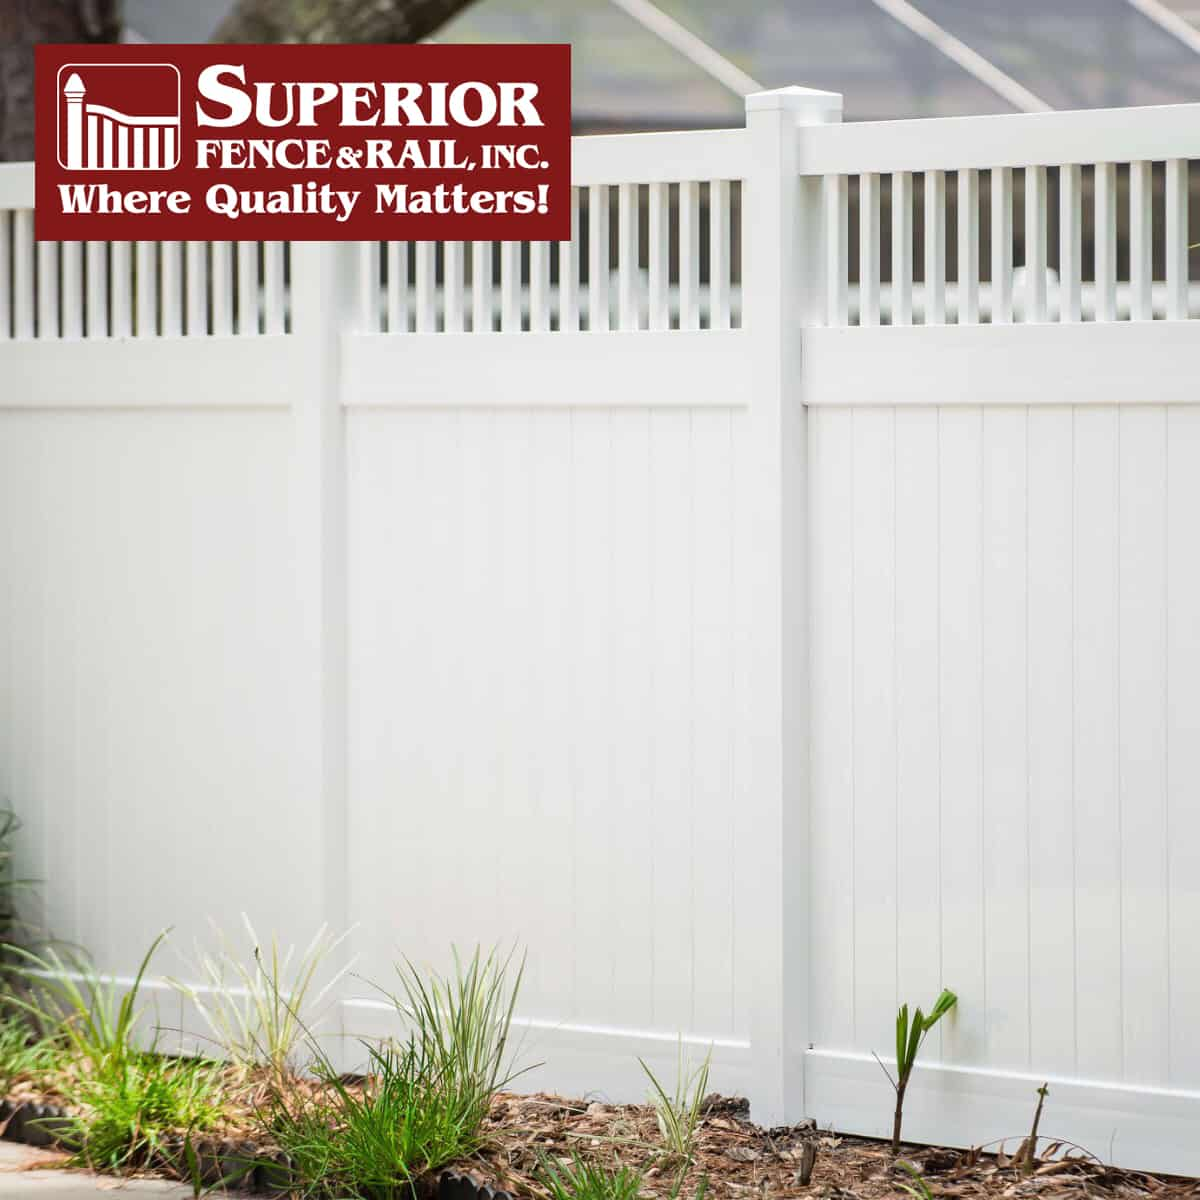 https://www.superiorfenceandrail.com/wp-content/uploads/2020/12/Hampden-Fence-Company-Contractor.jpg